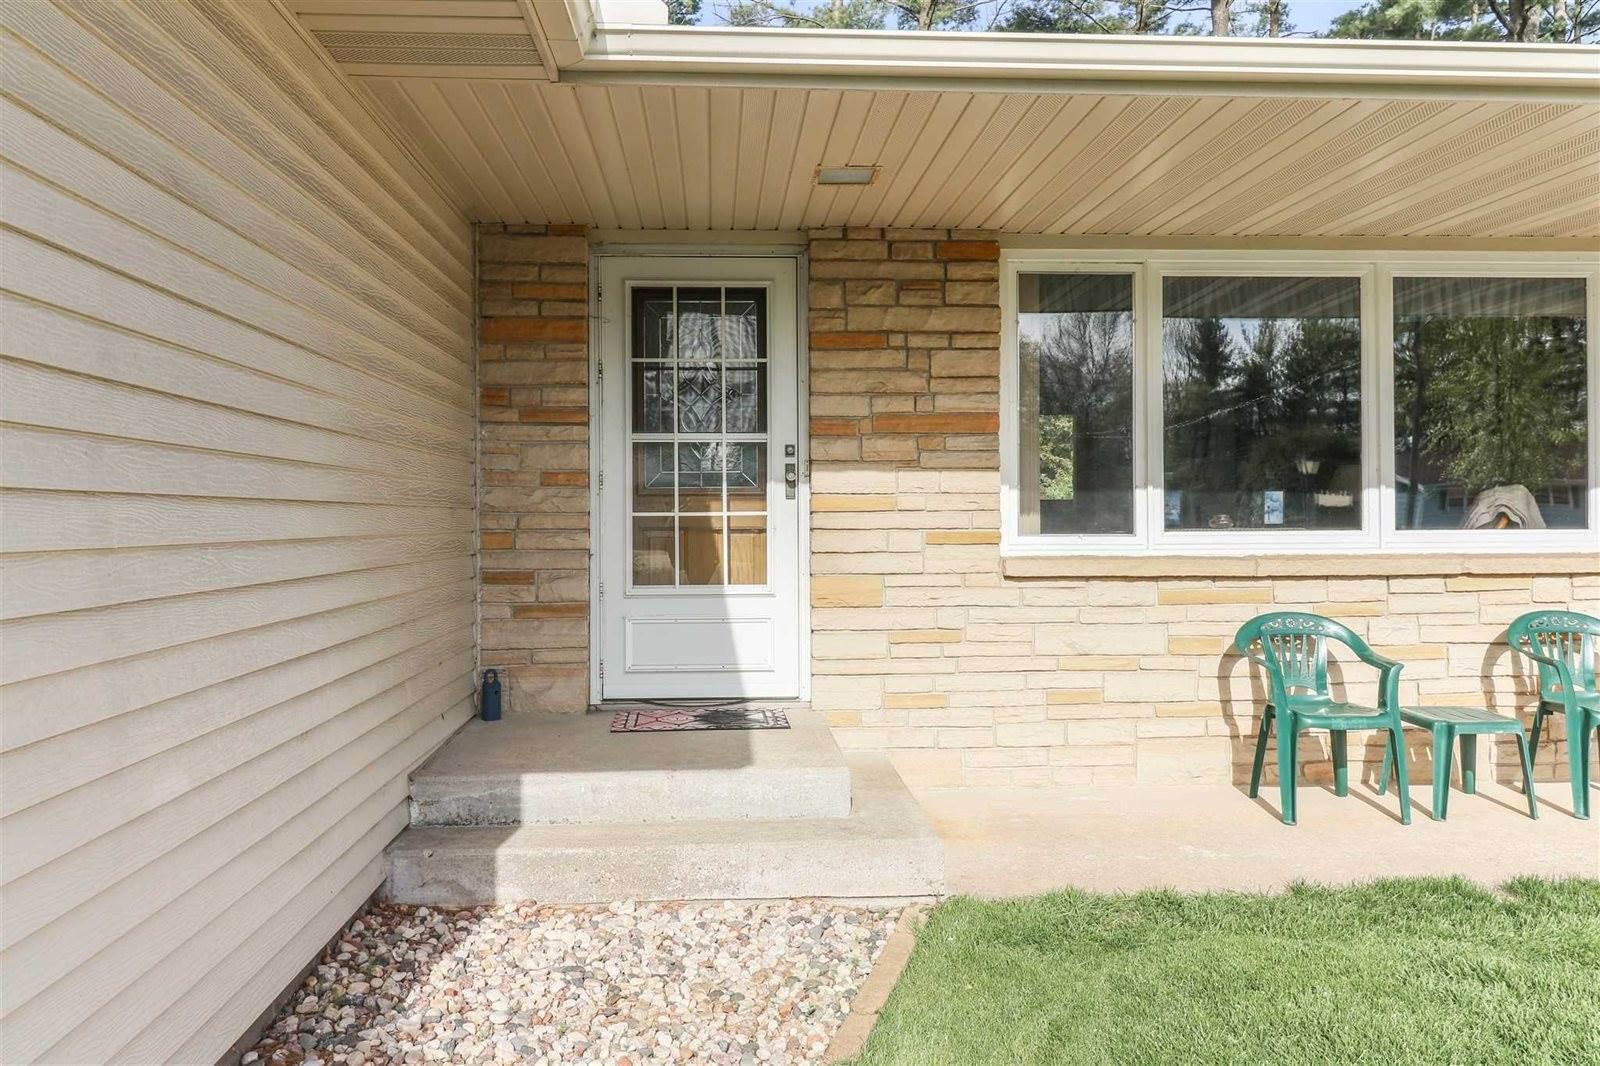 3120 S 3rd Street, Wisconsin Rapids, WI 54494